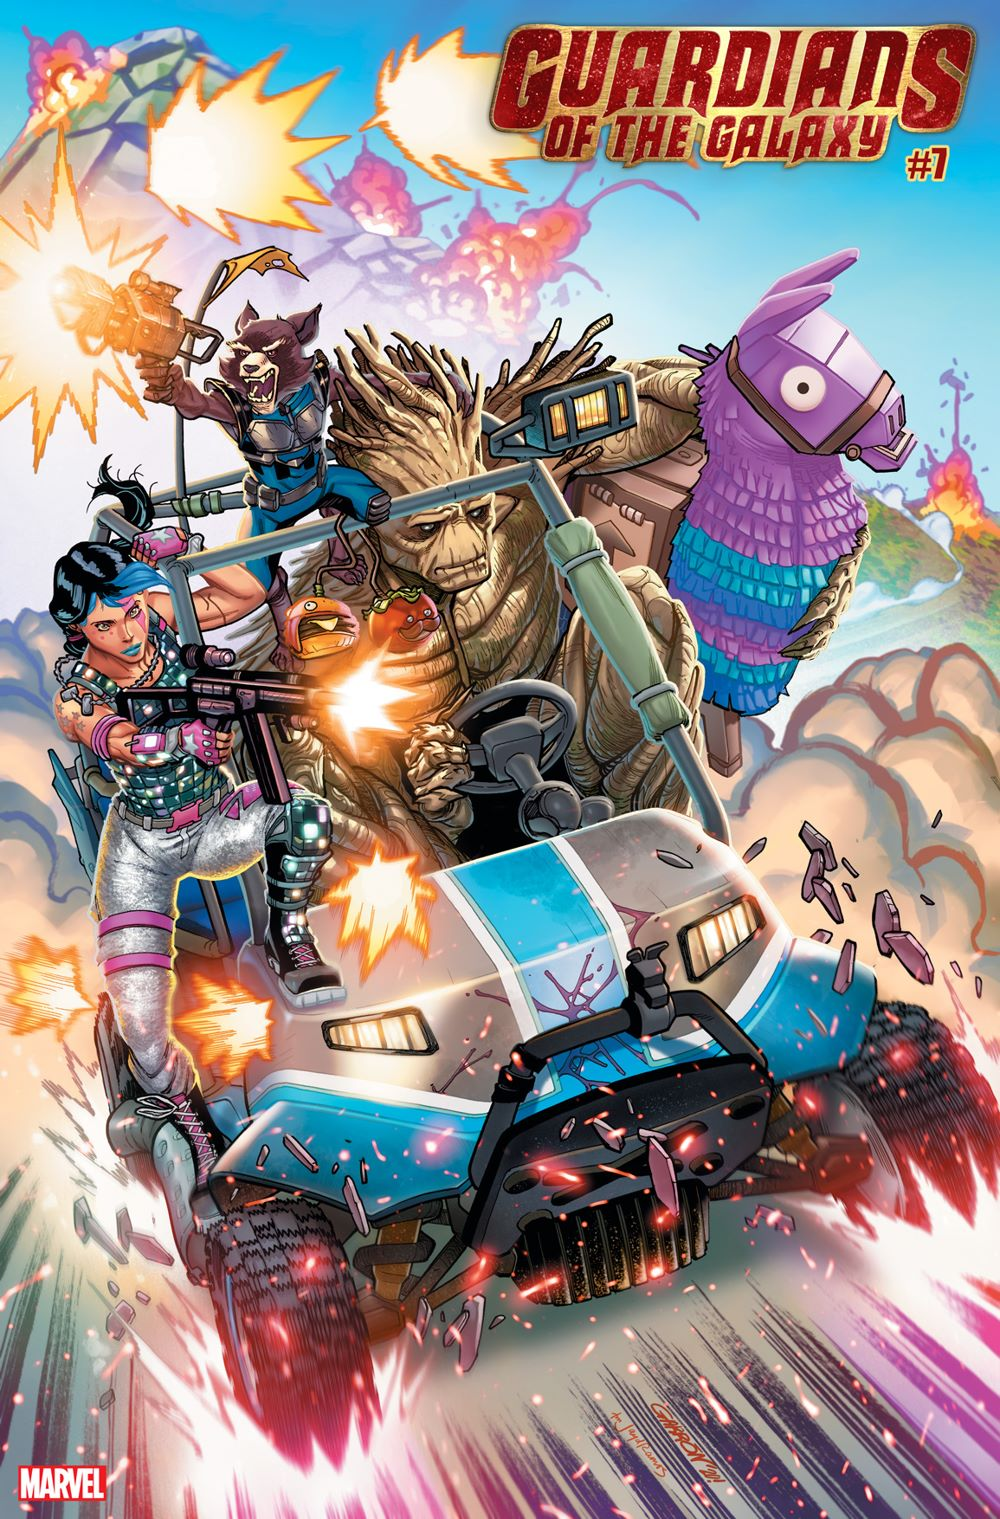 GARGAL2020007_Garron_FortniteVariant Marvel and Fortnite characters unite on special variant covers